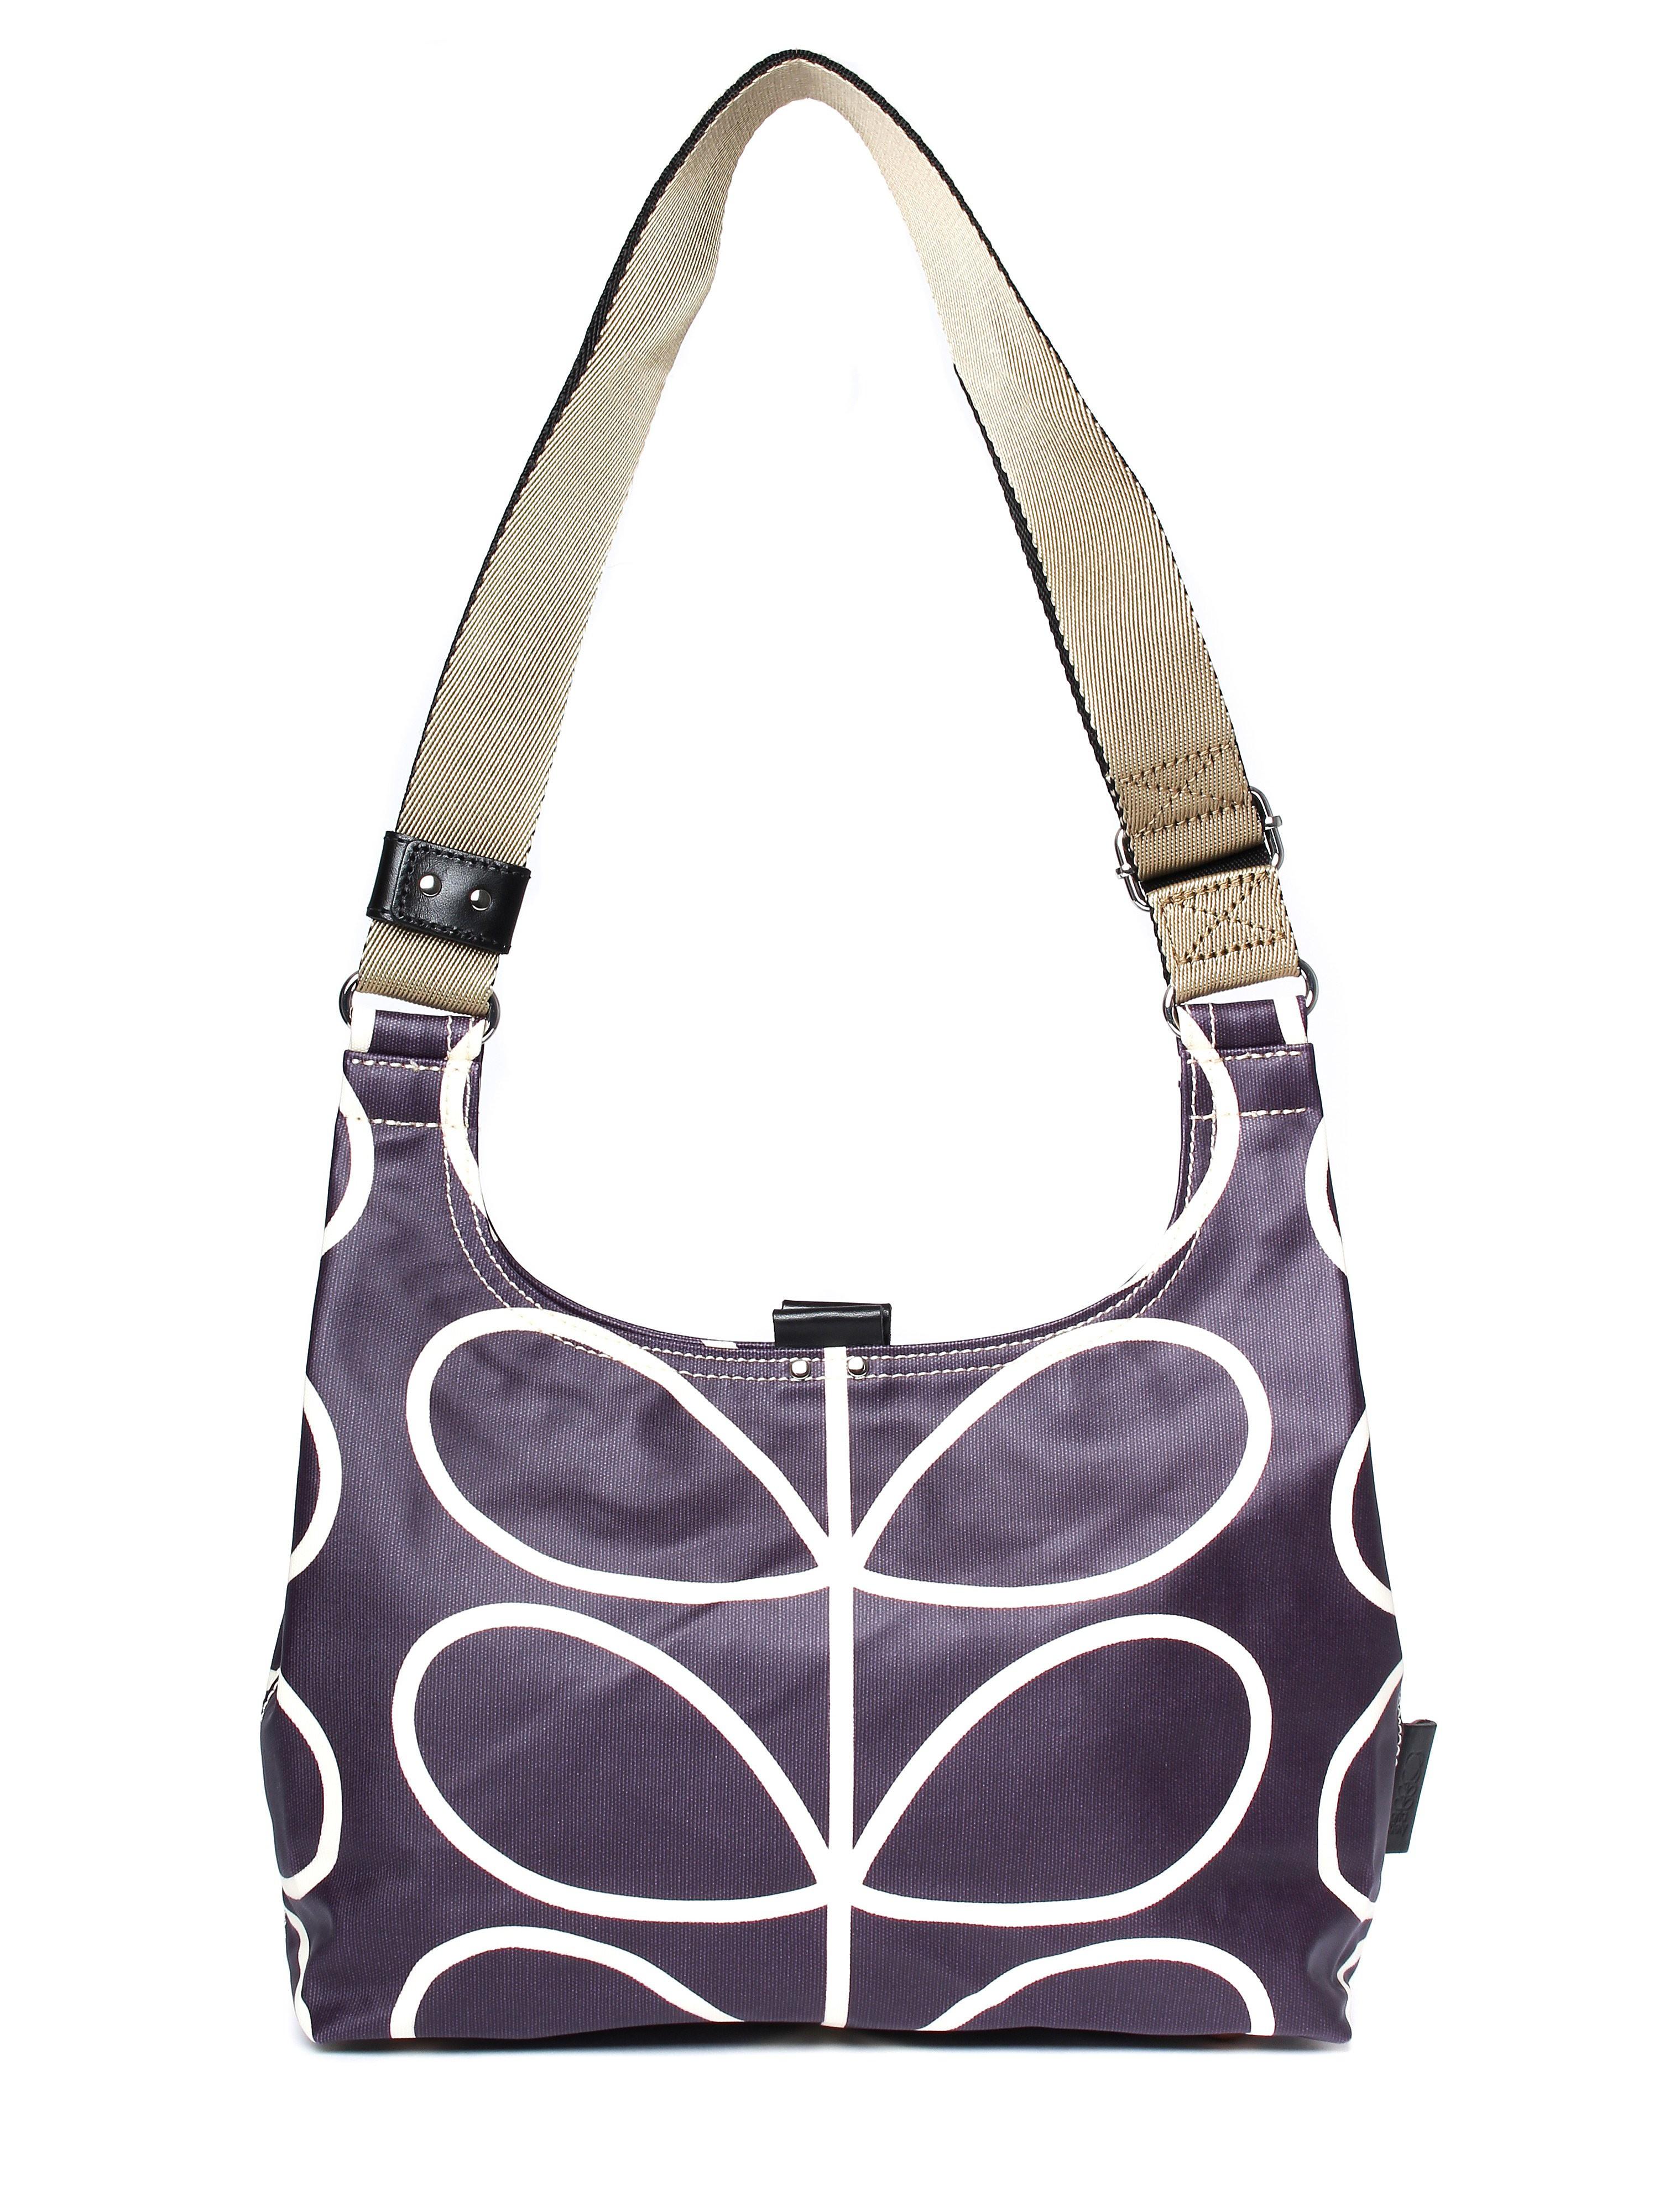 Orla Kiely Women's Midi Sling Bag - Orchid